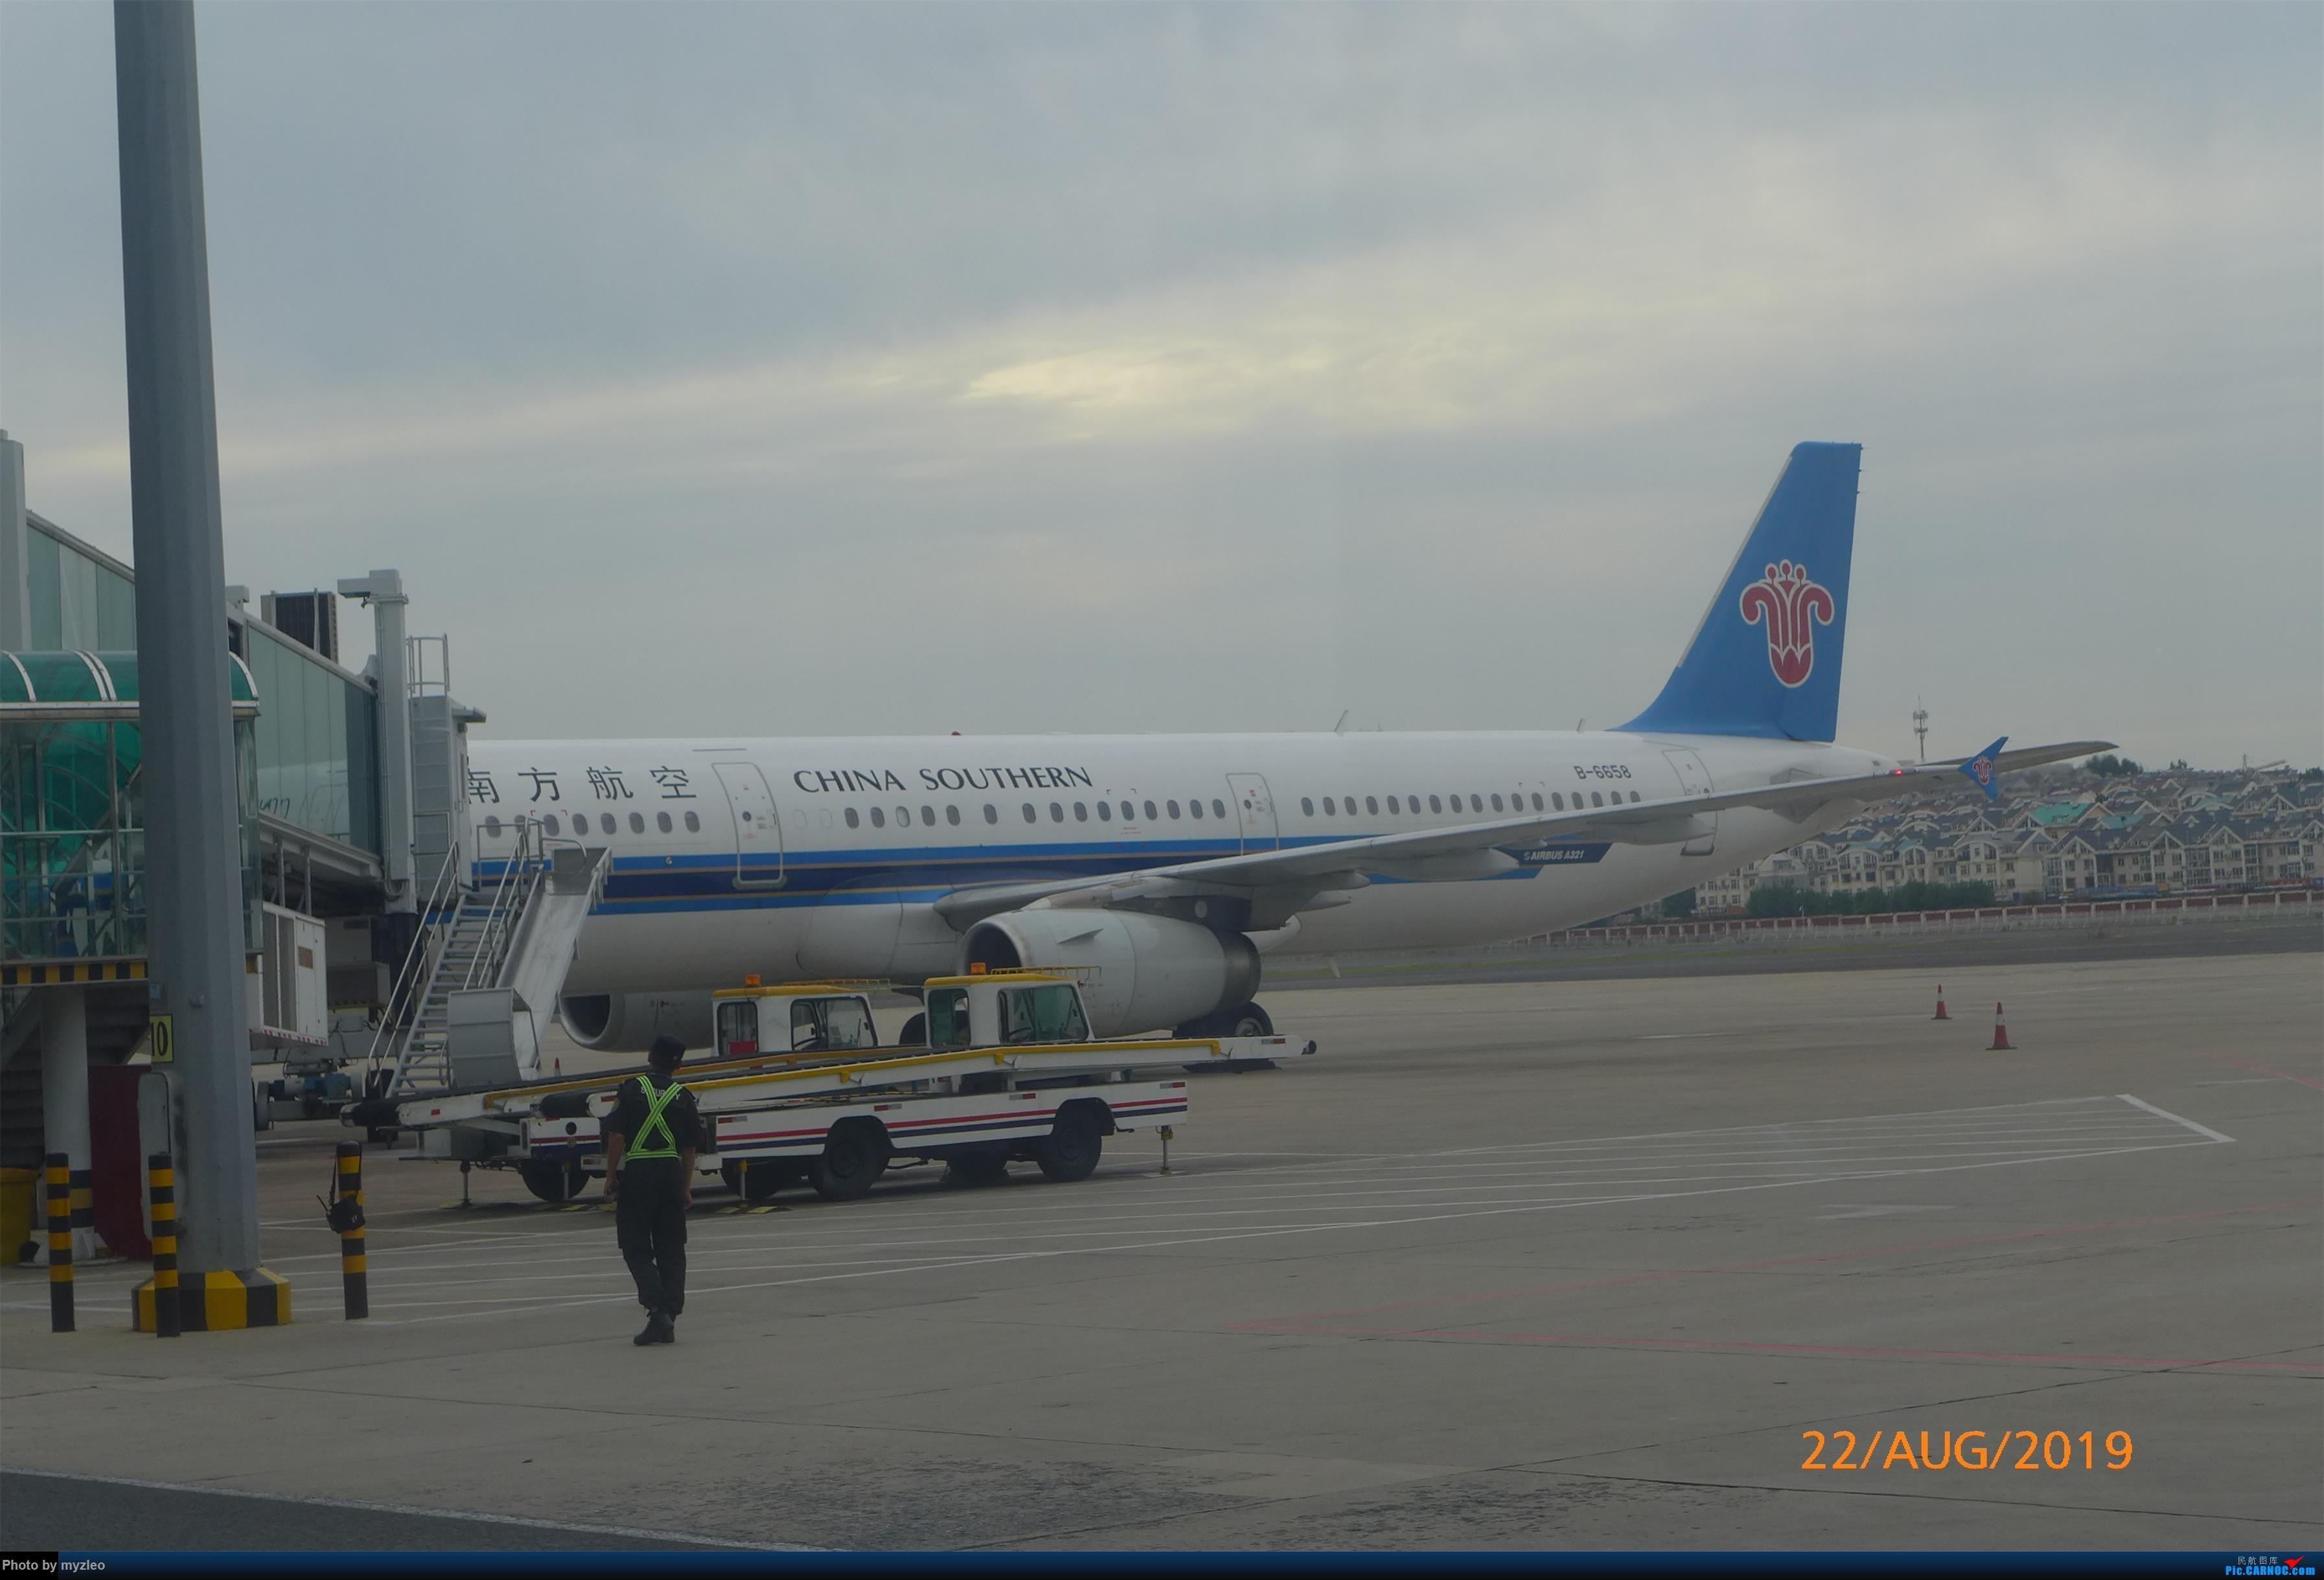 Re:[原创]【myzleo的游记5.2】梦圆一九(2)首访南苑把梦圆,初搭巴航连新缘 AIRBUS A321-200 B-6658 中国大连国际机场